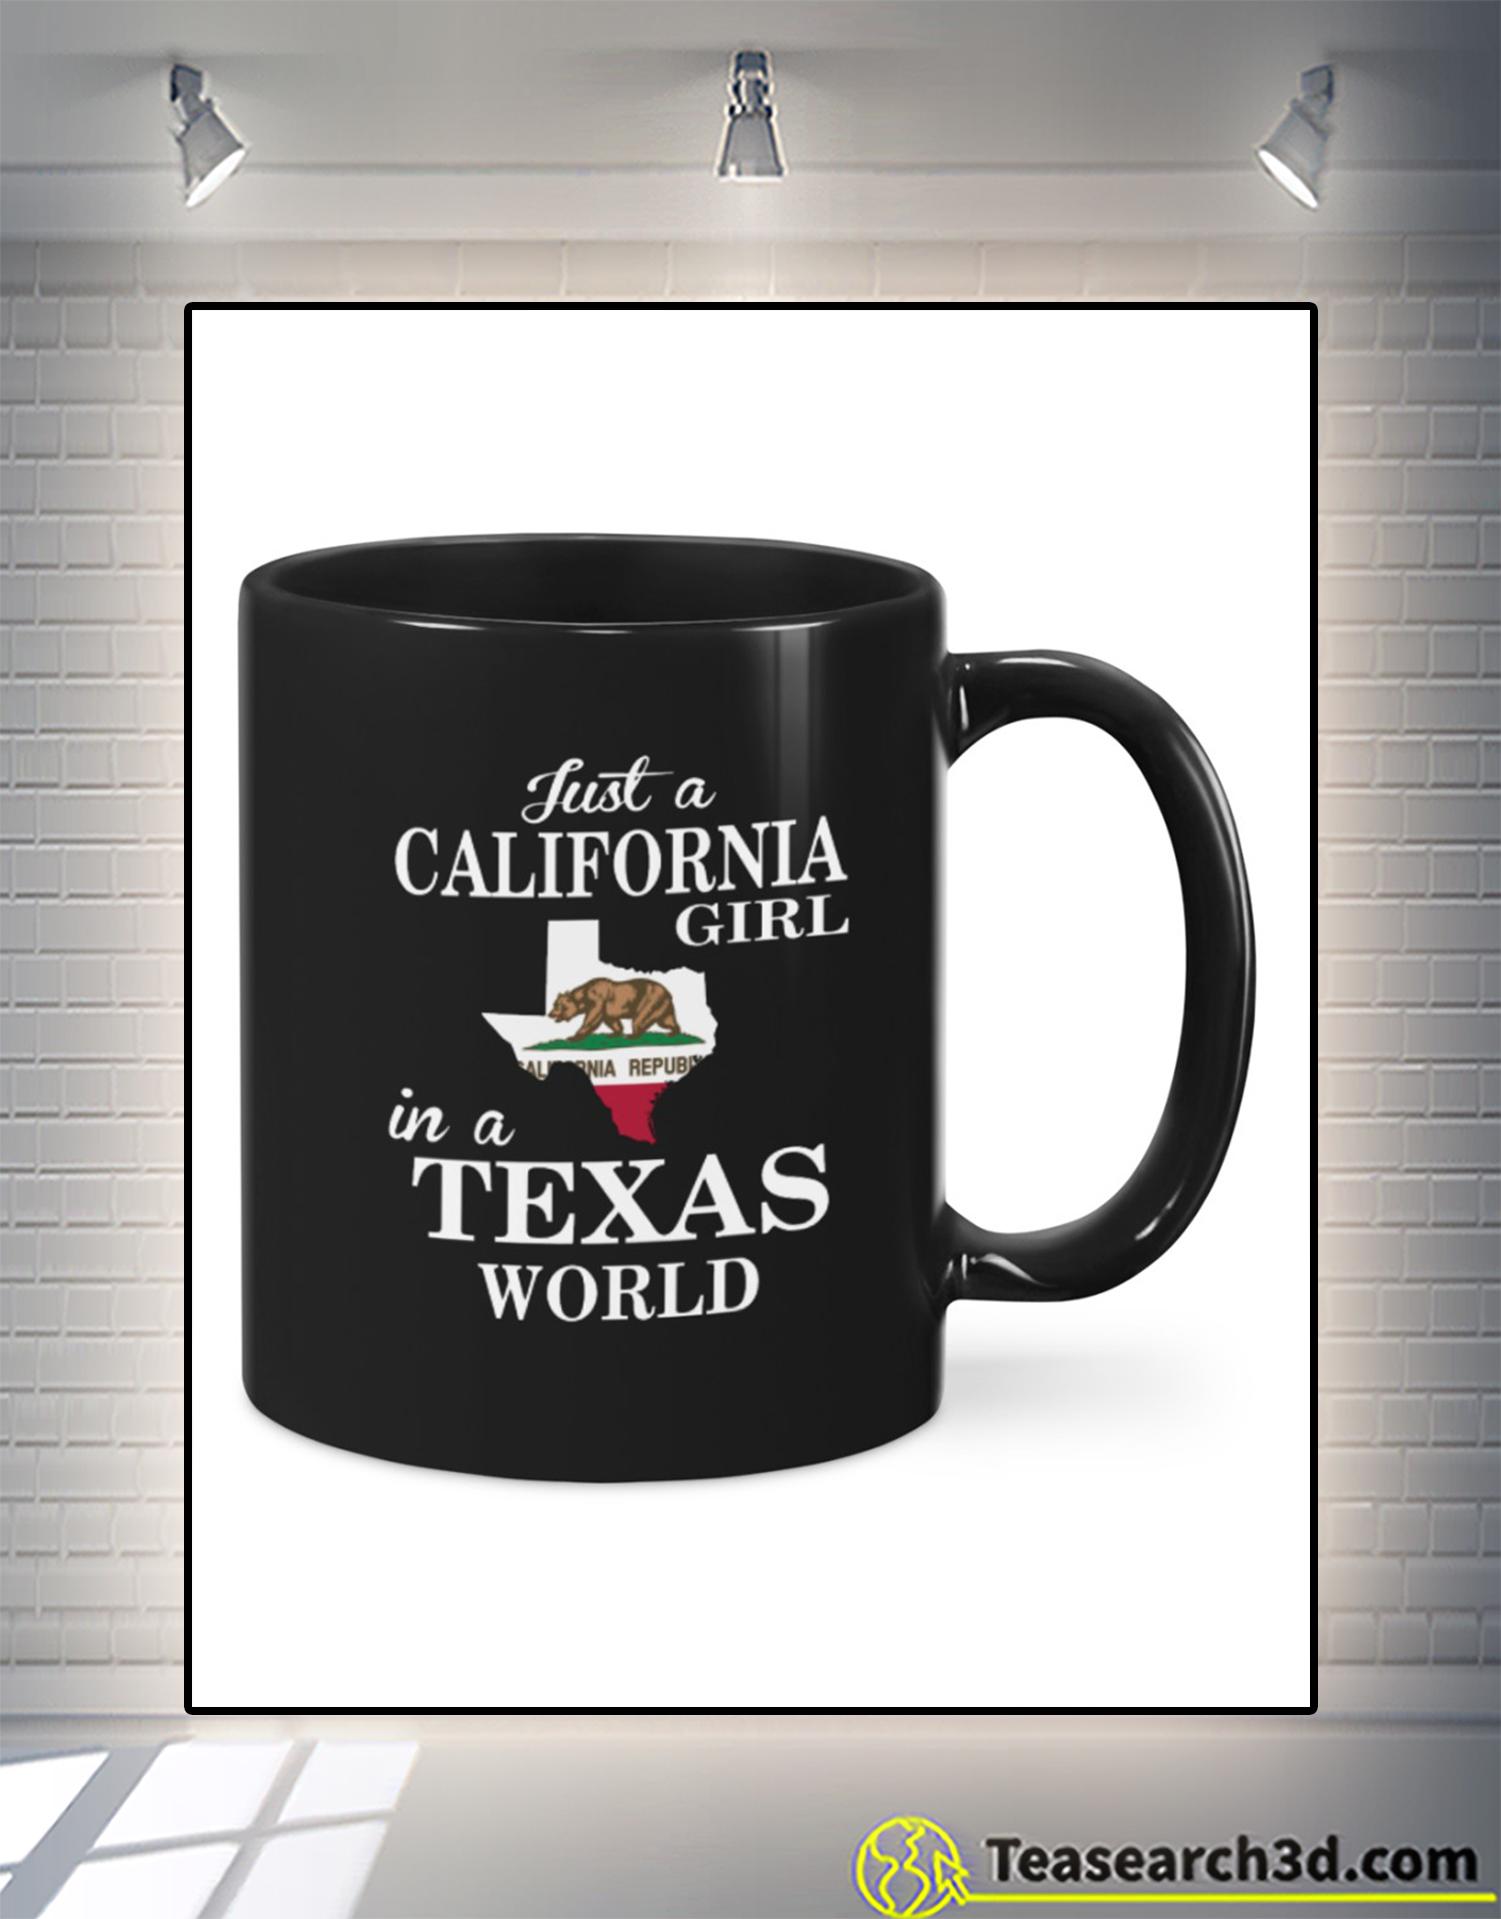 Just a california girl in a texas world mug